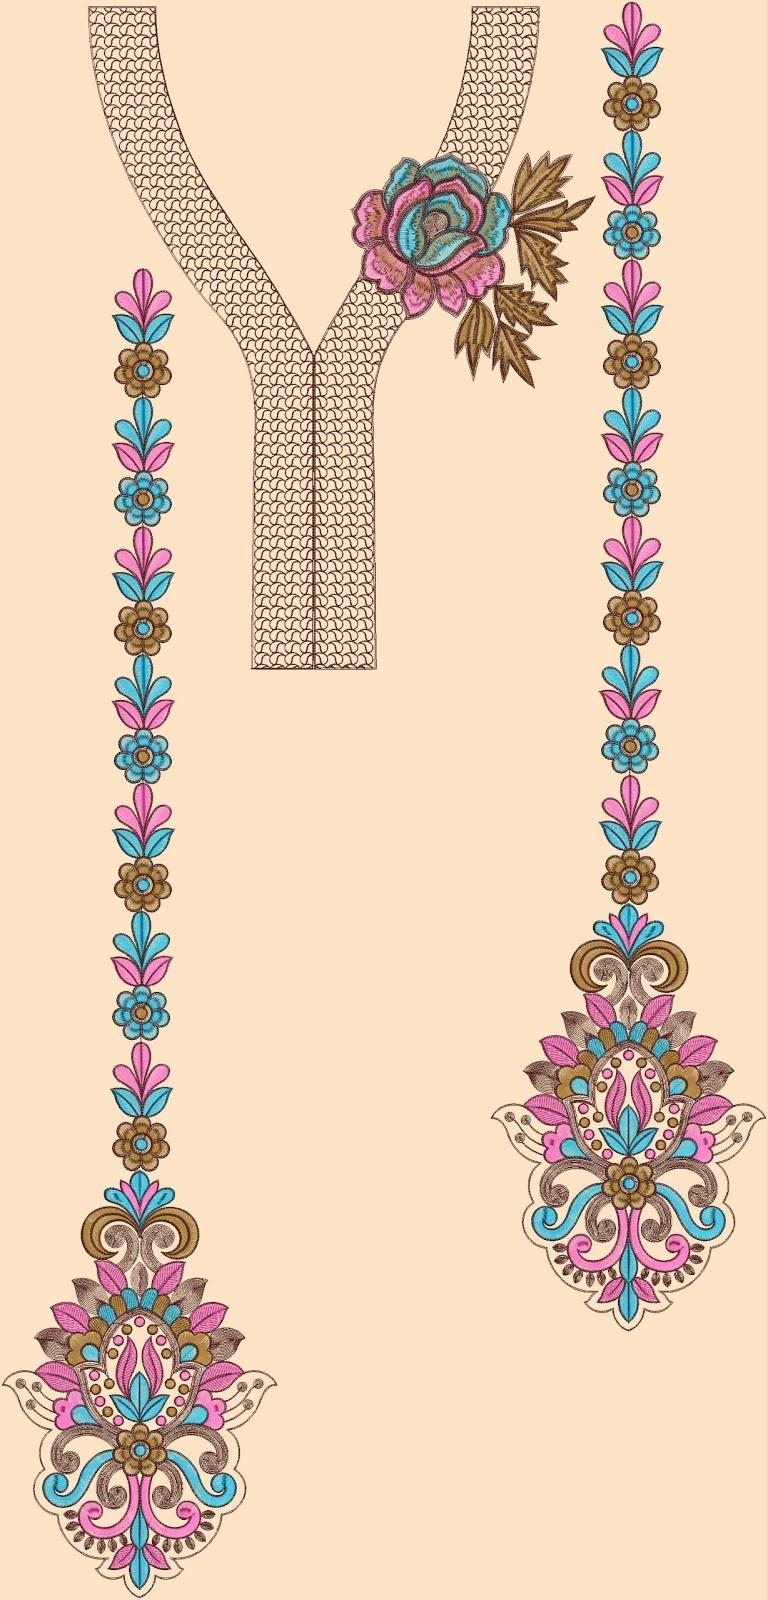 Embroidery designs kurtis neck makaroka